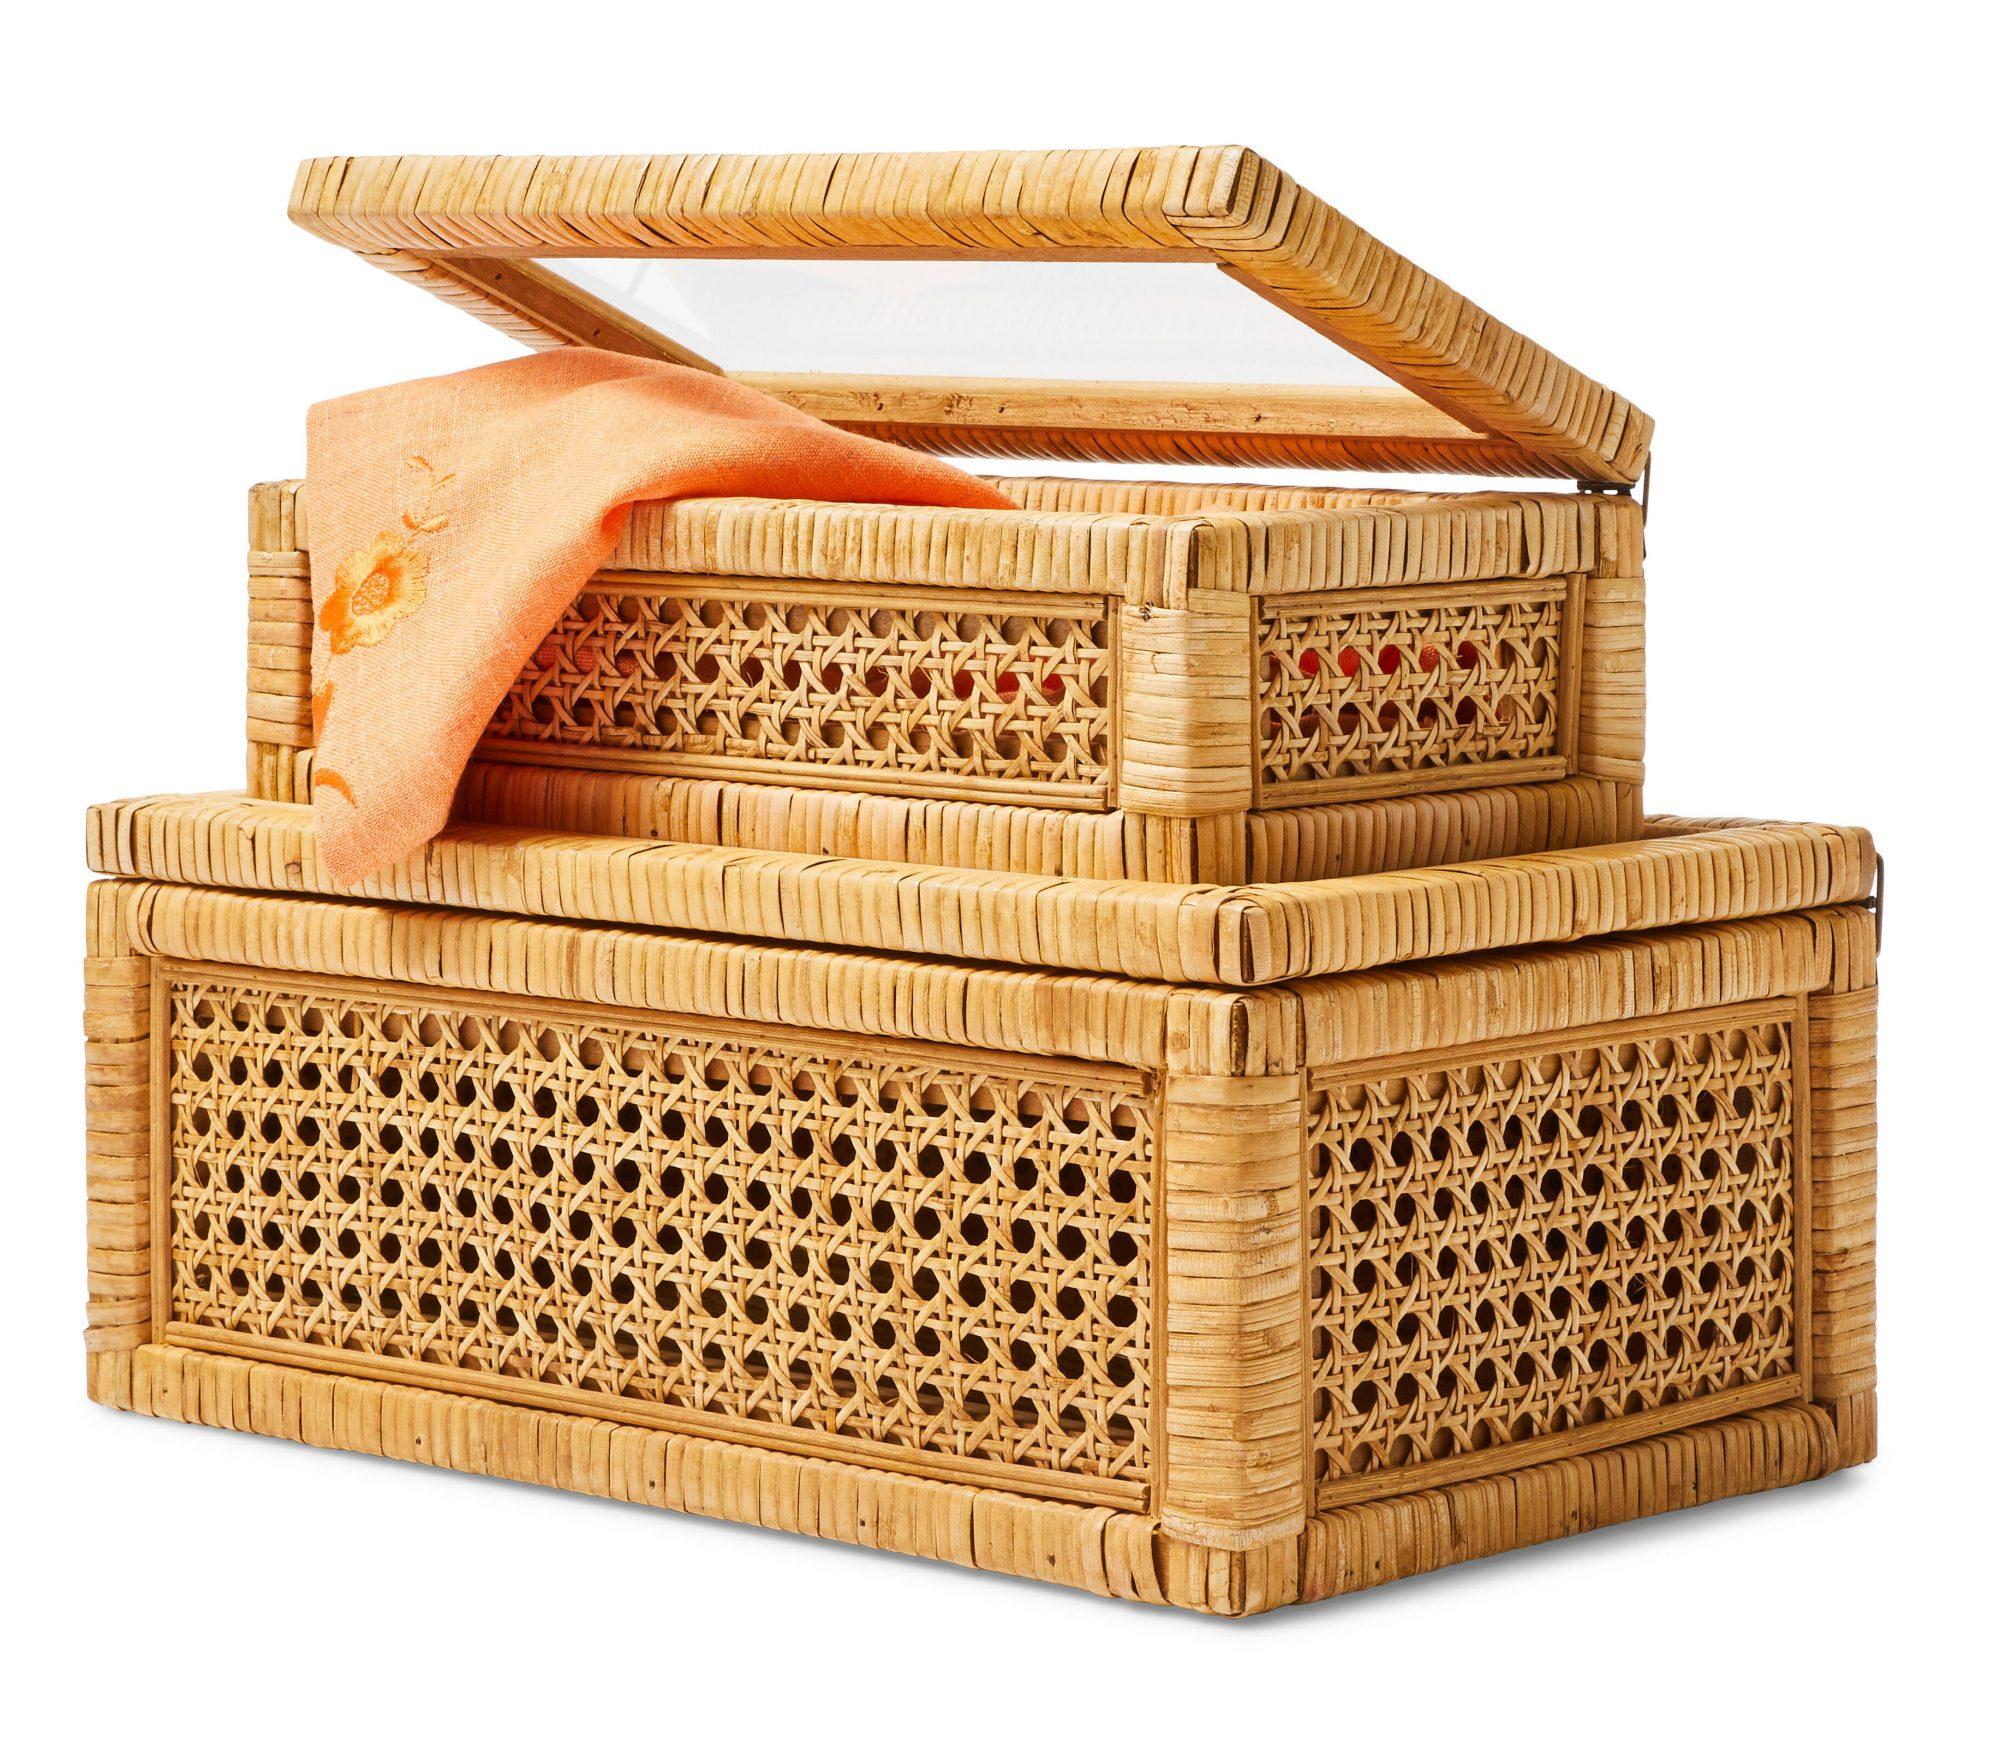 Rattan Display Boxes